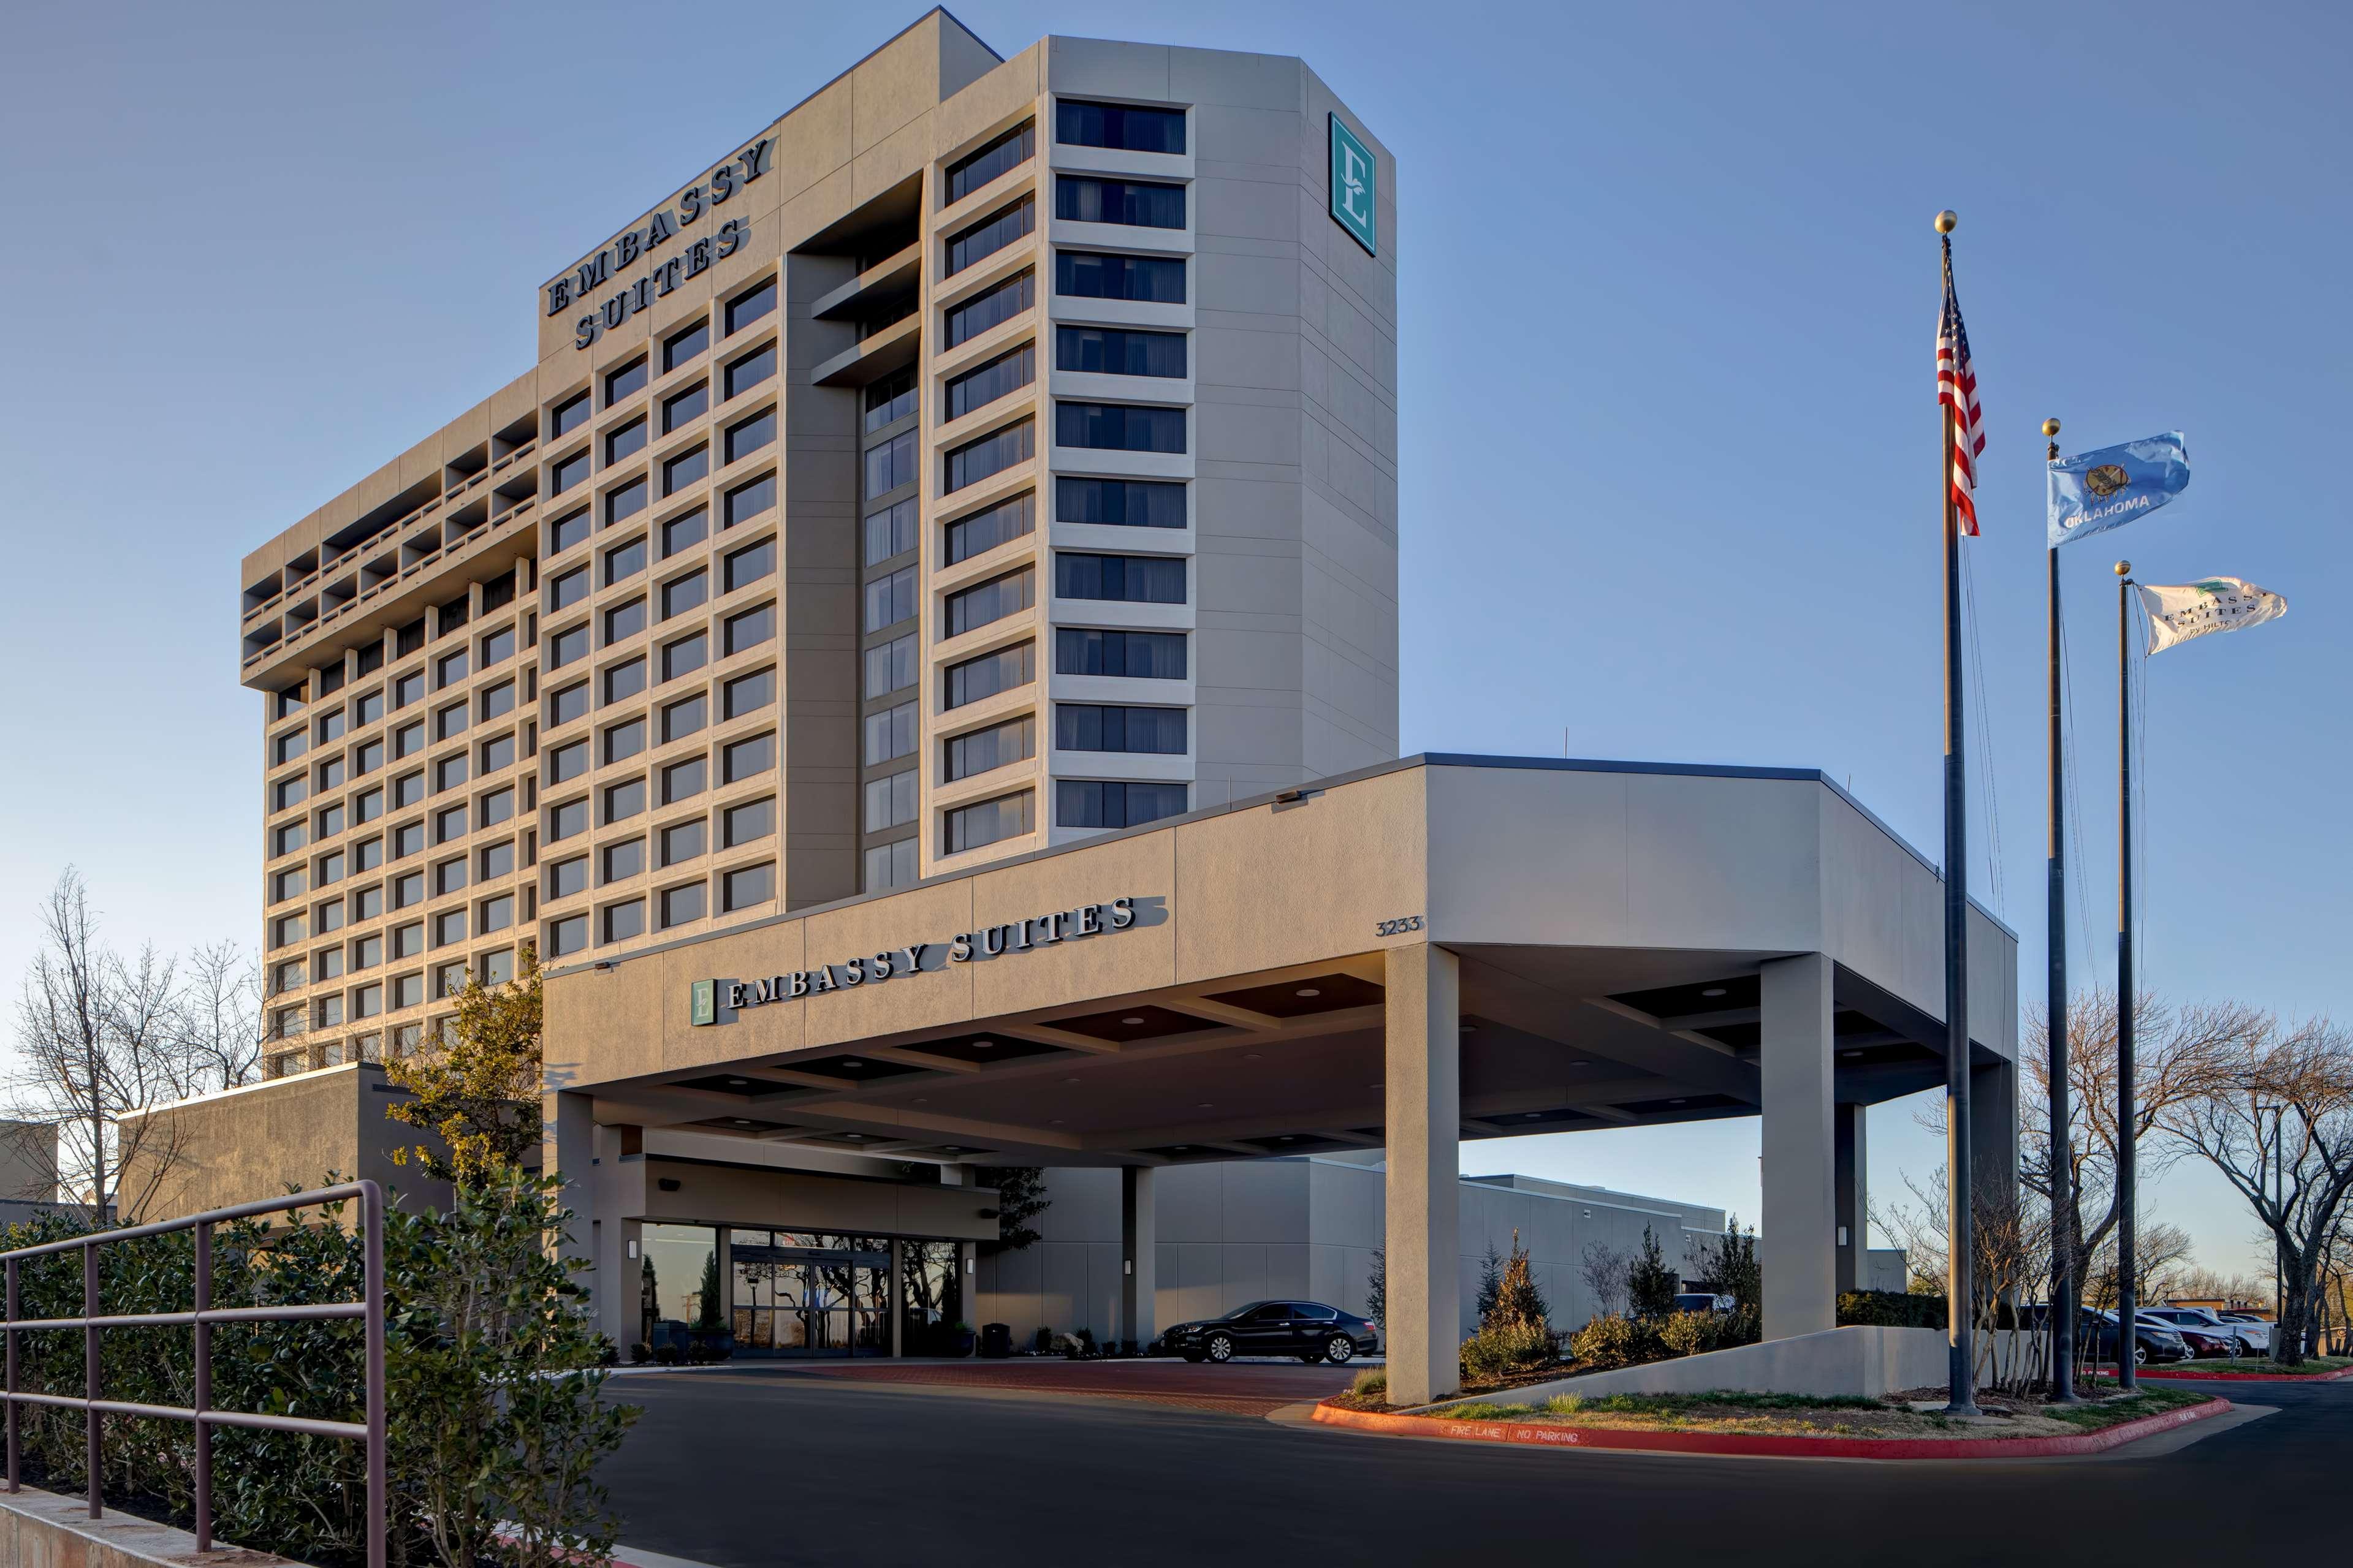 Embassy Suites by Hilton Oklahoma City Northwest